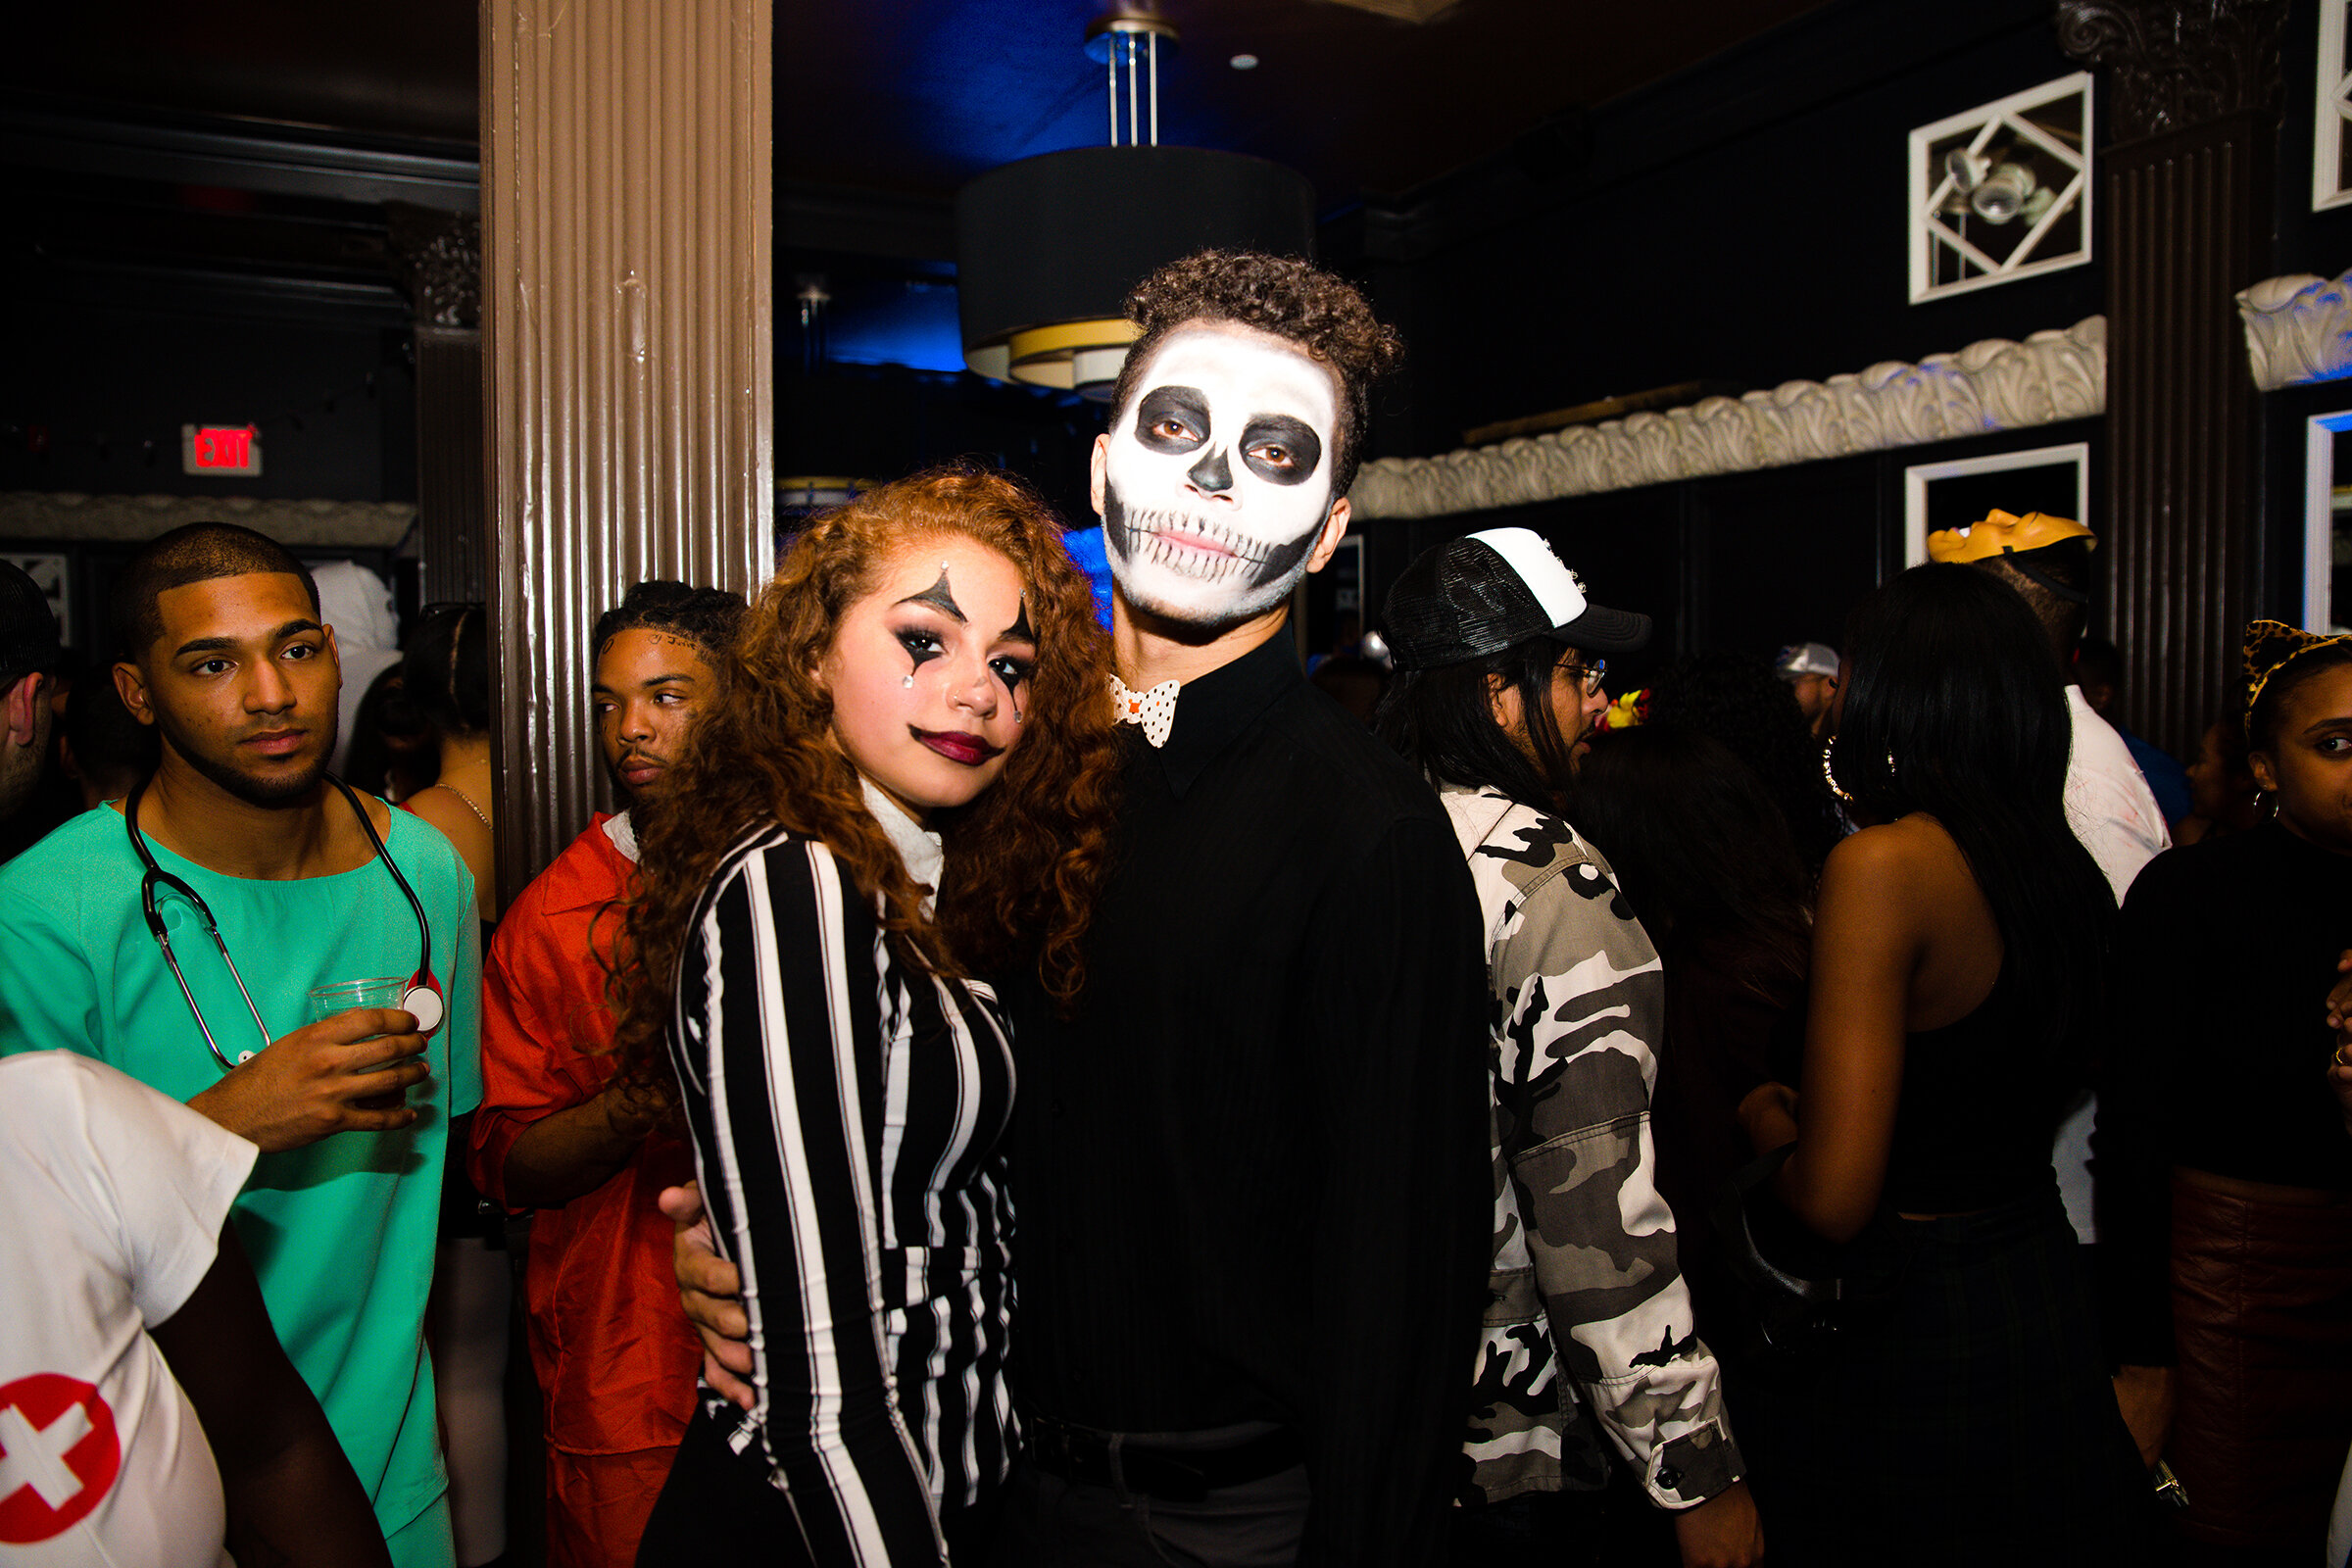 halloween2019-13halloween2019.jpg